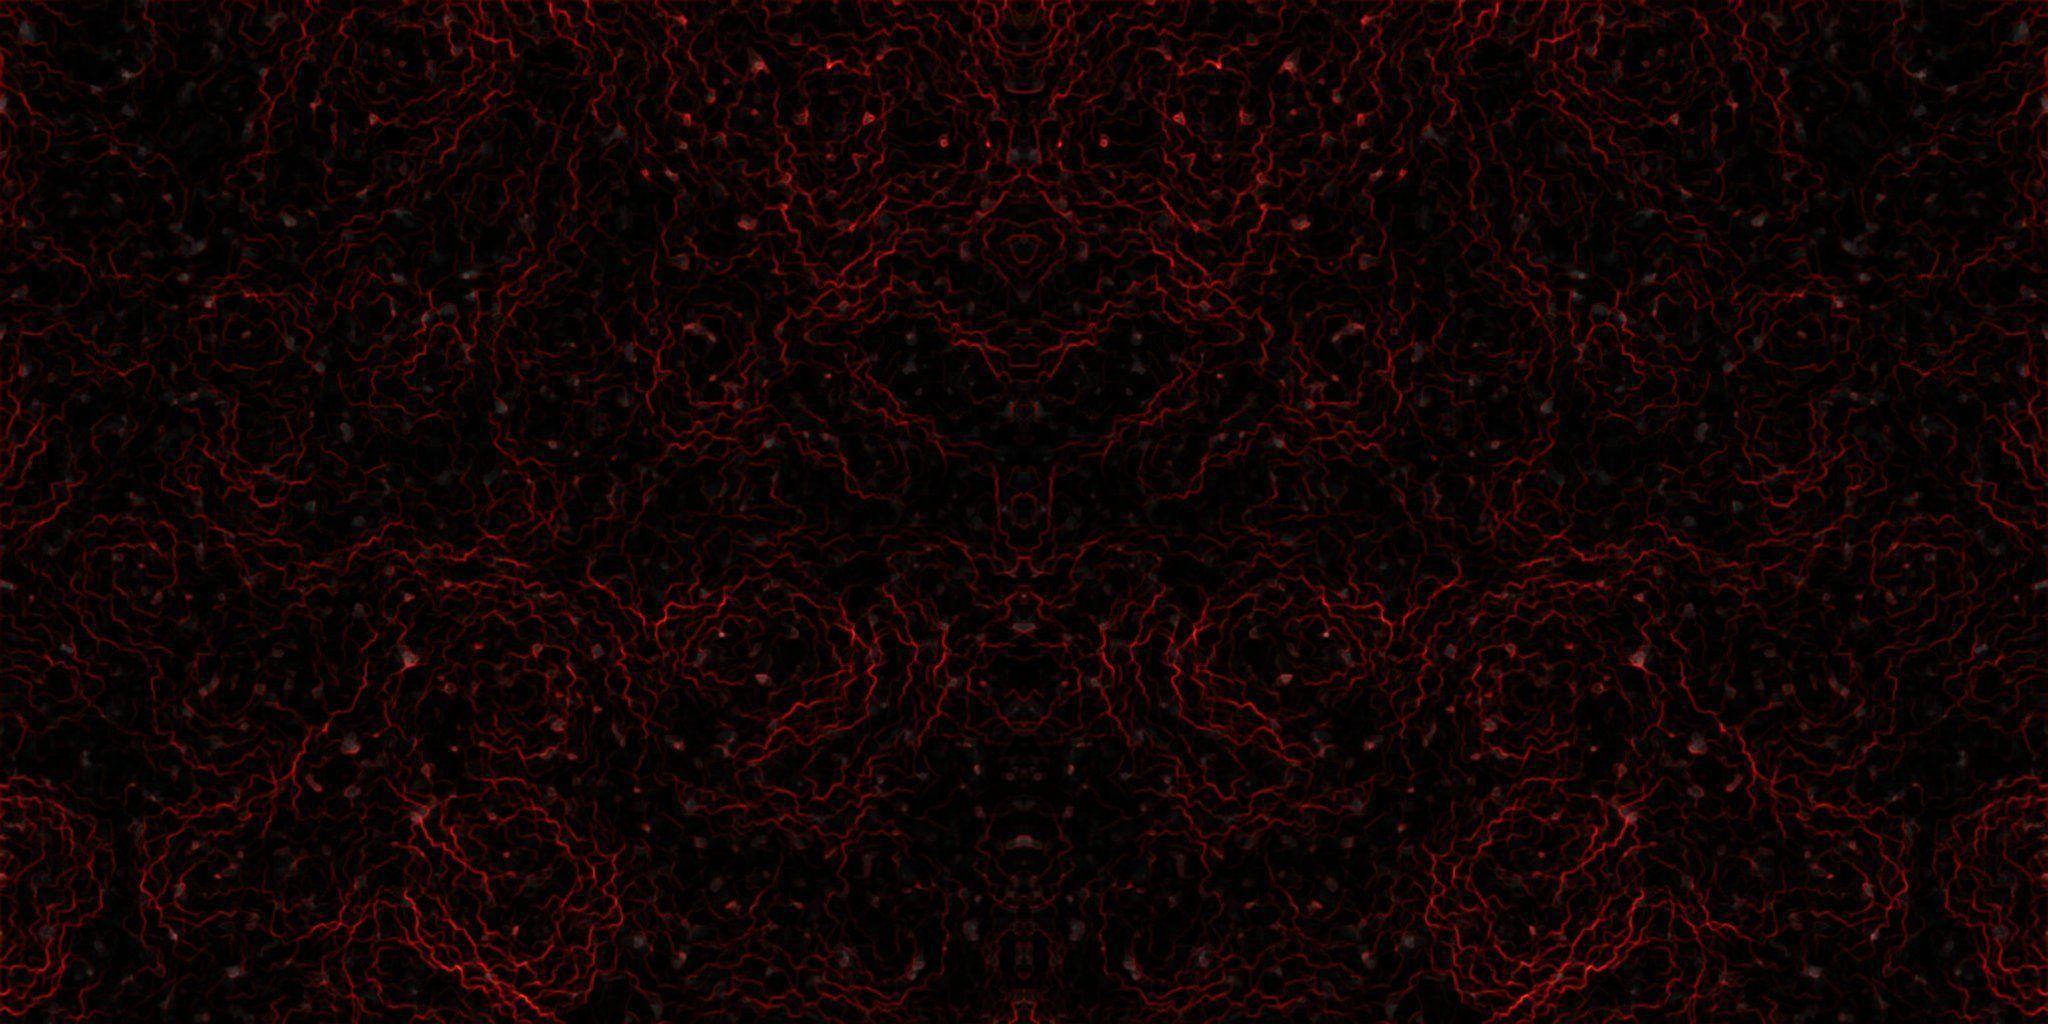 Satanic Wallpapers - Wallpaper Cave